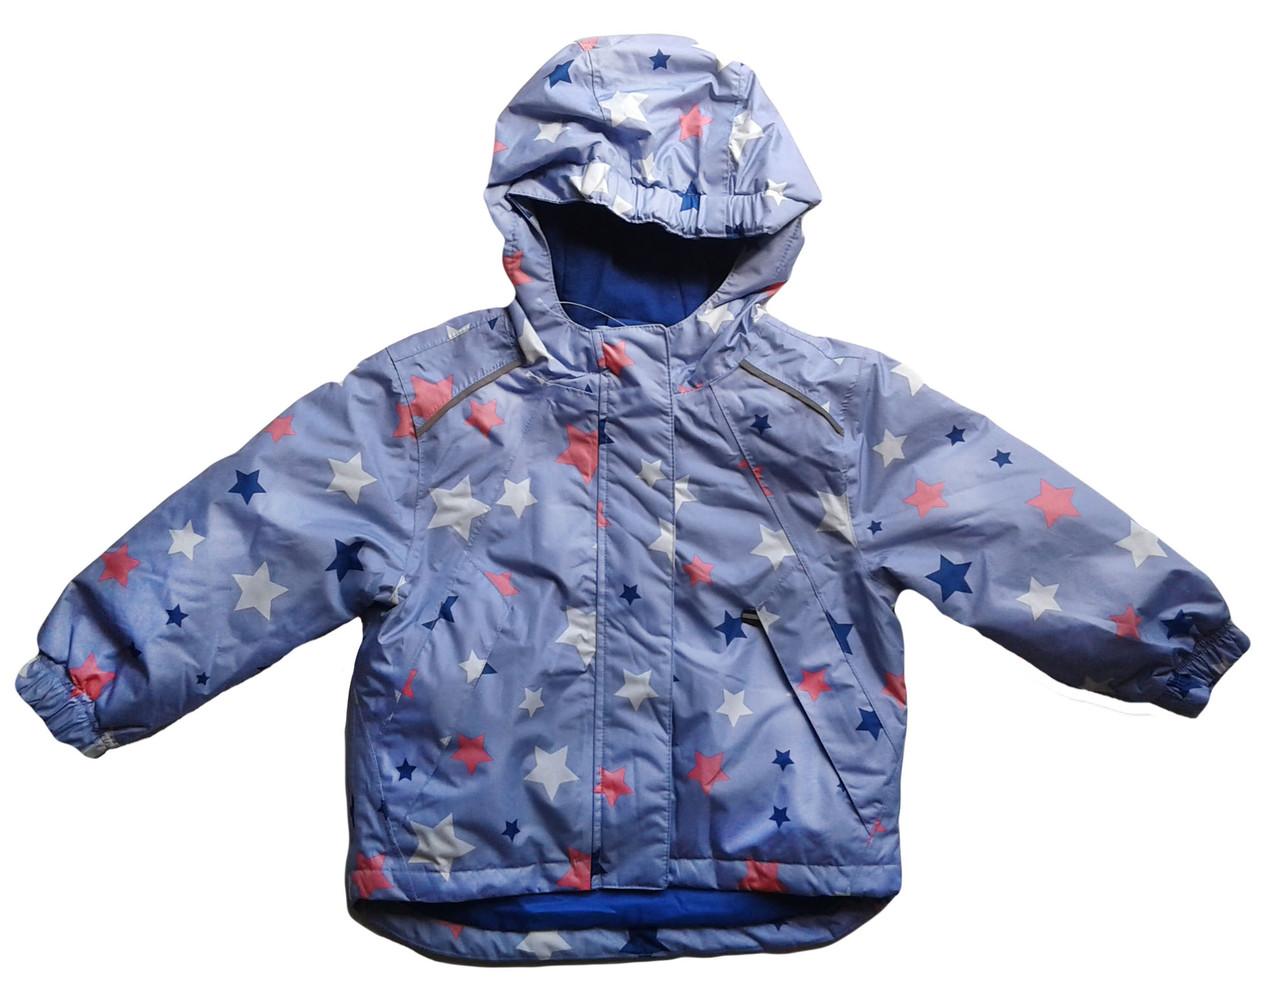 Куртка  для девочки, Lupilu, размер 86/92, арт. Л-426